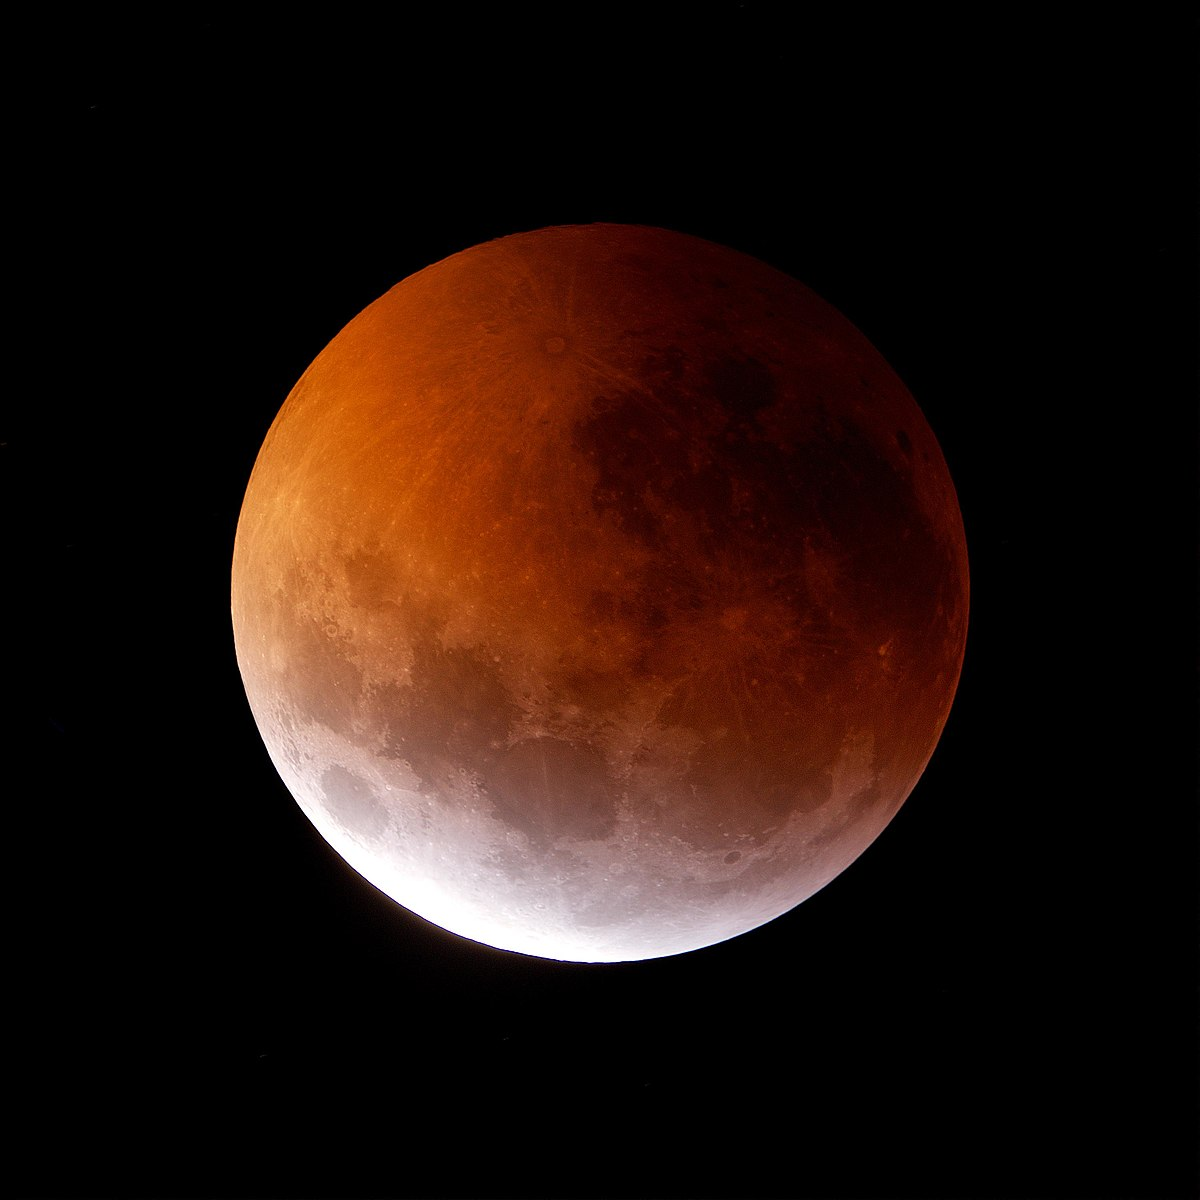 Calendario Lunar 2020 Espana.Eclipse Lunar Wikipedia La Enciclopedia Libre